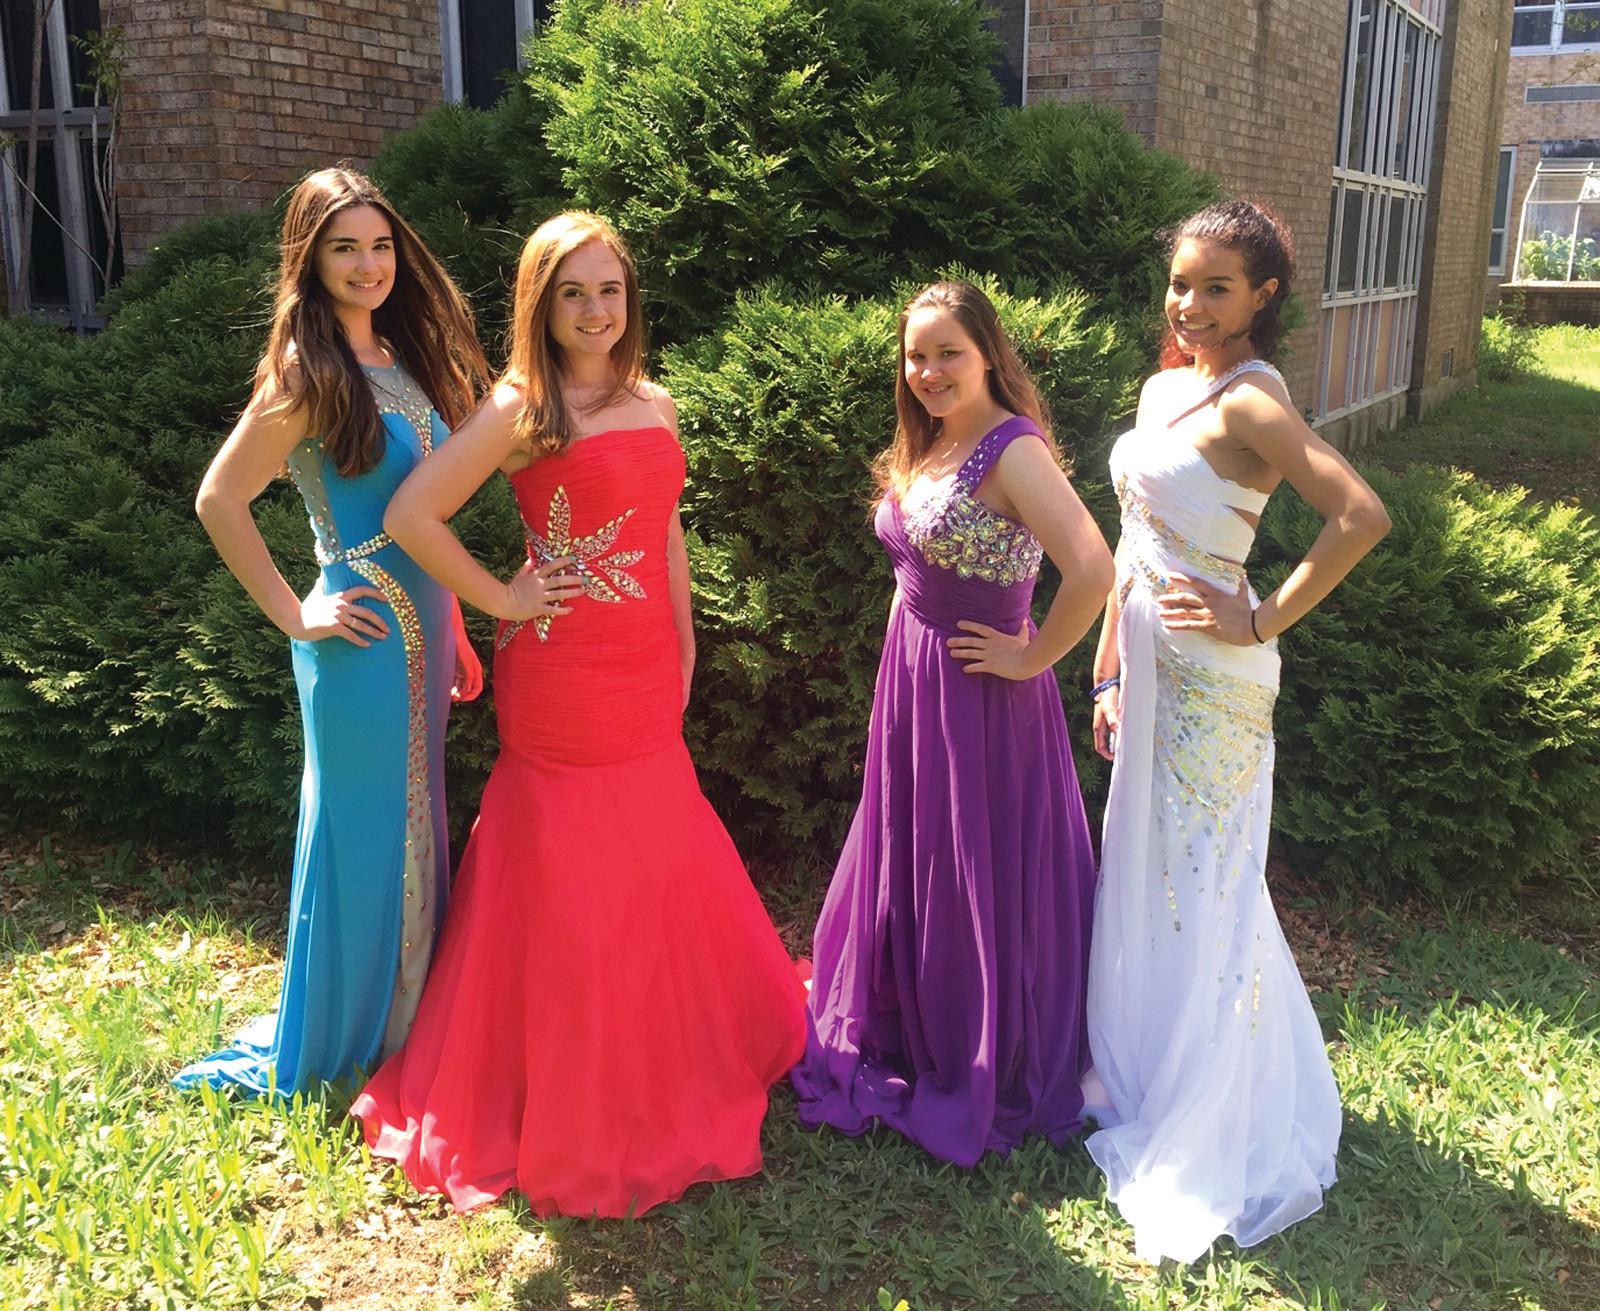 Dress exchange offers girls a Cinderella story | Johnston Sun Rise